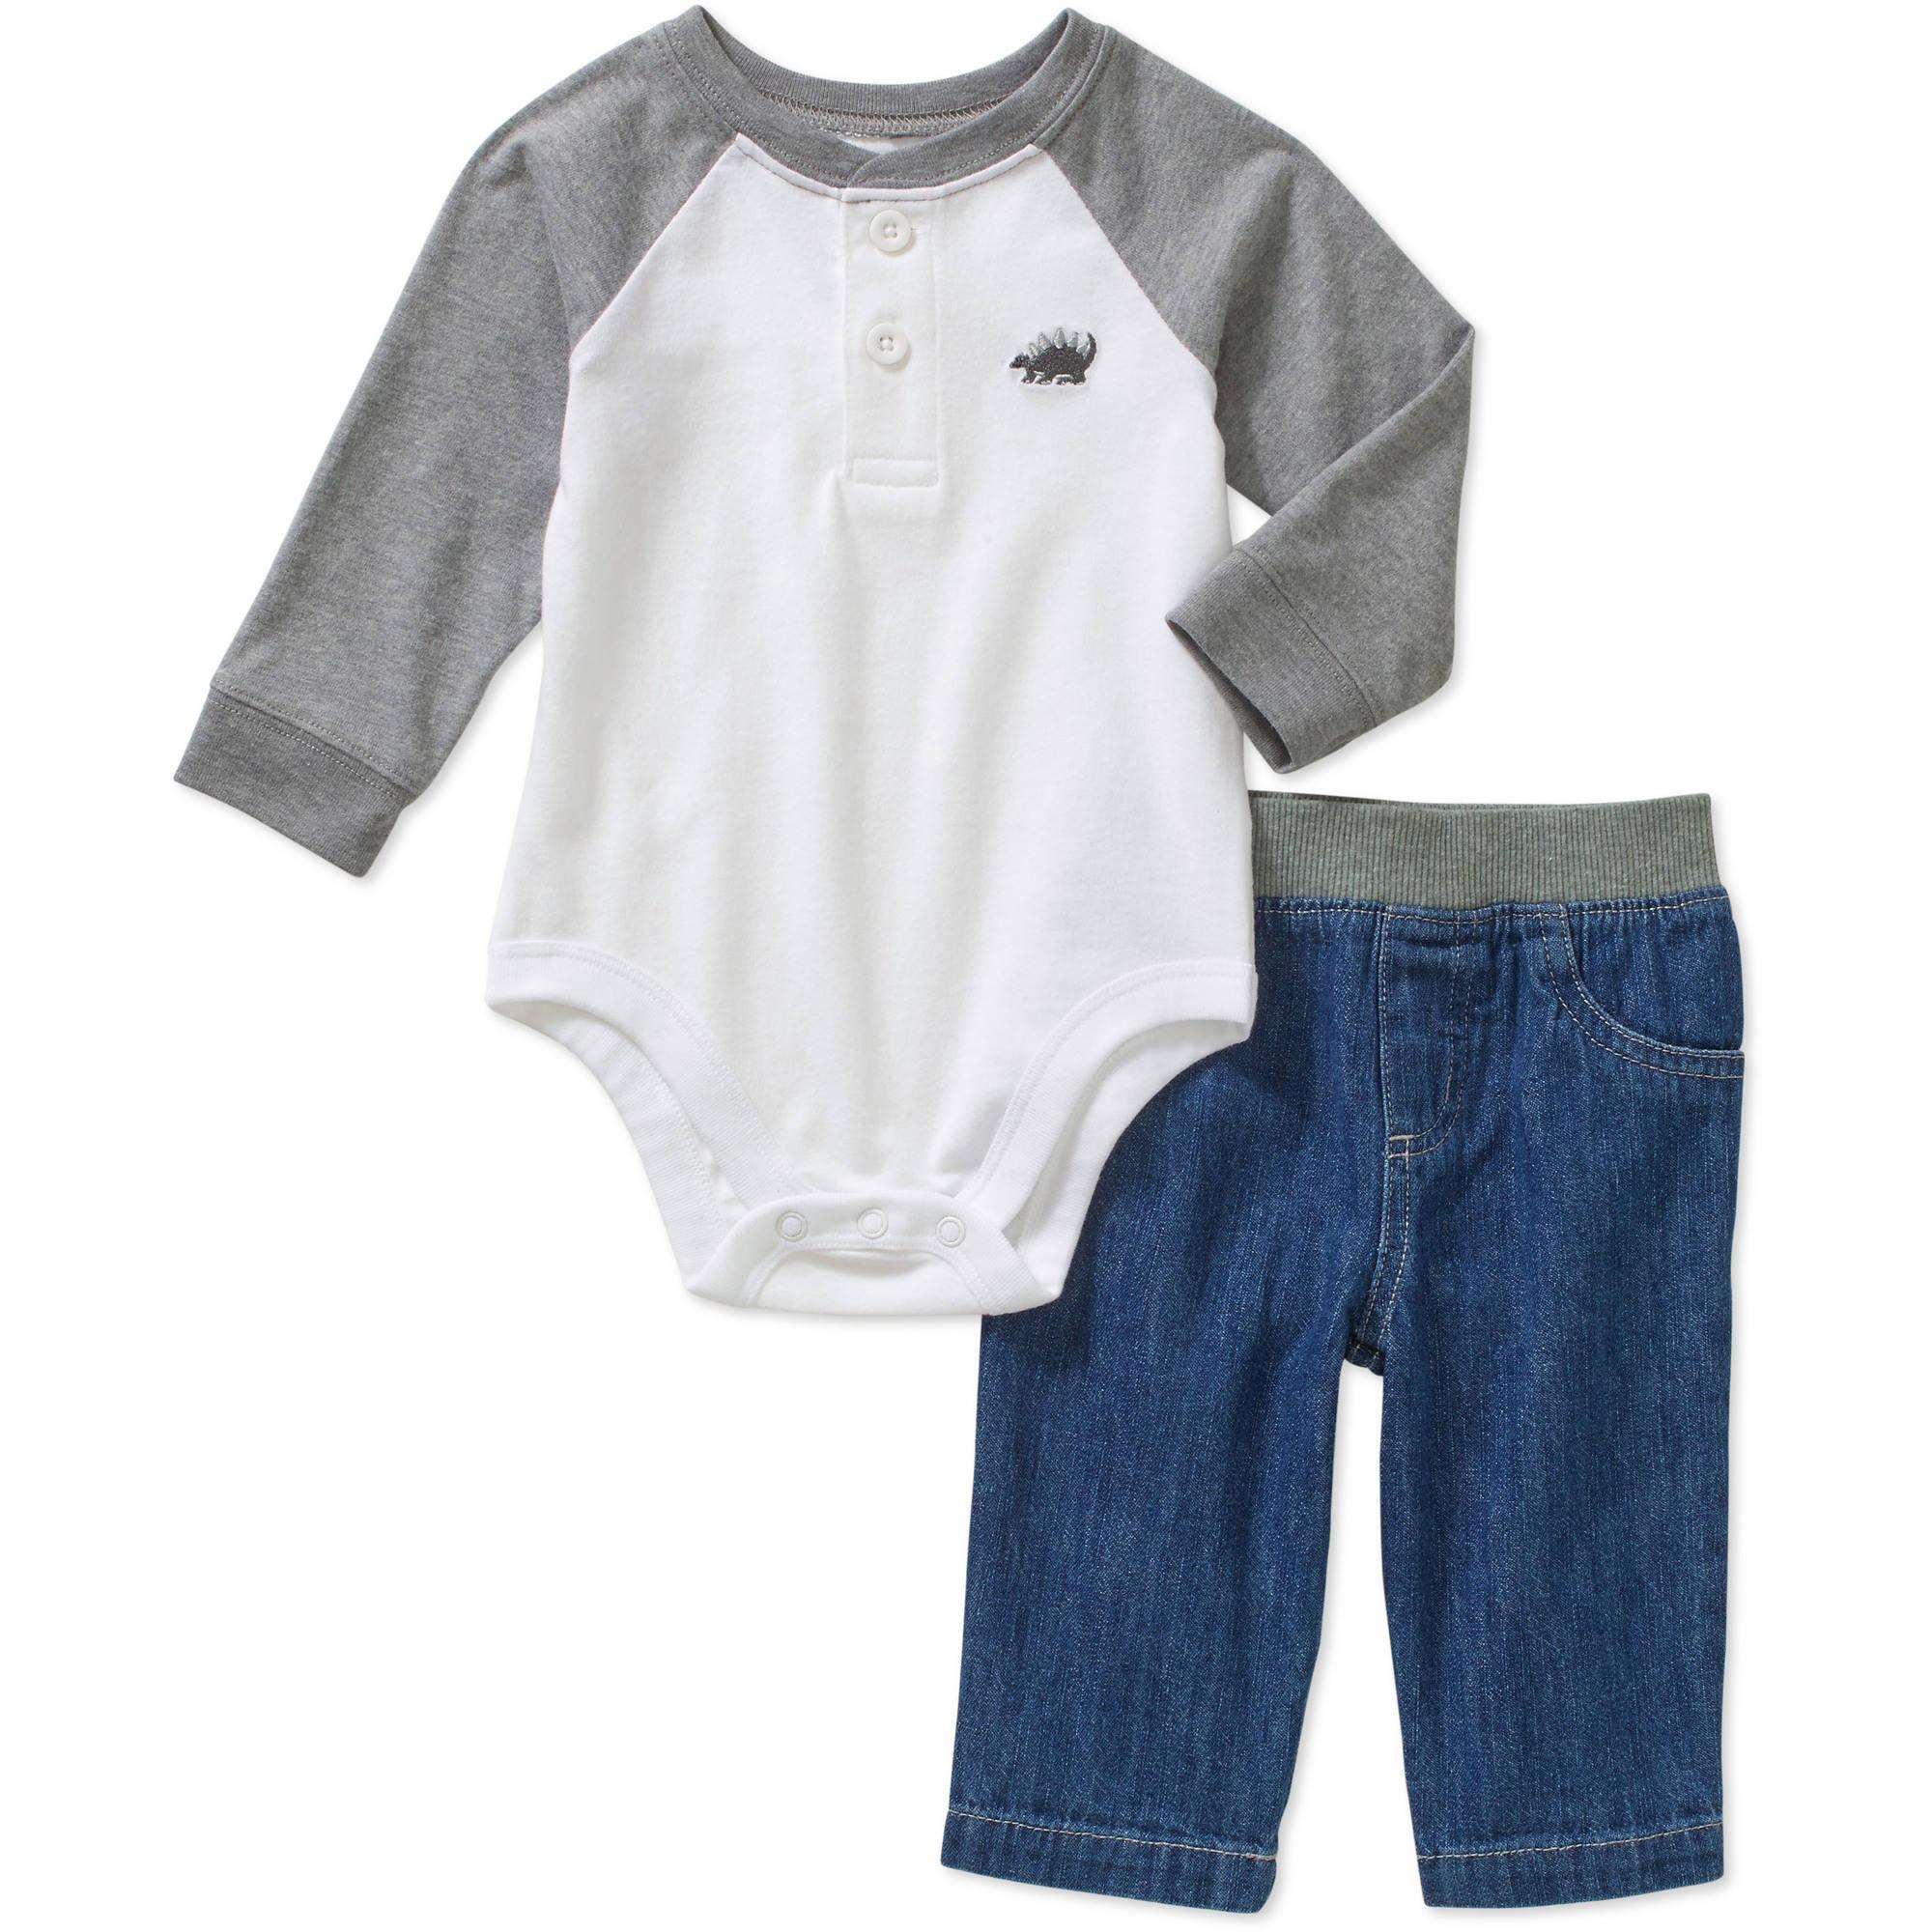 Garanimals Newborn Baby Boys' Sueded Jersey Raglan Bodysuit and Woven Pants 2-Piece Outfit Set